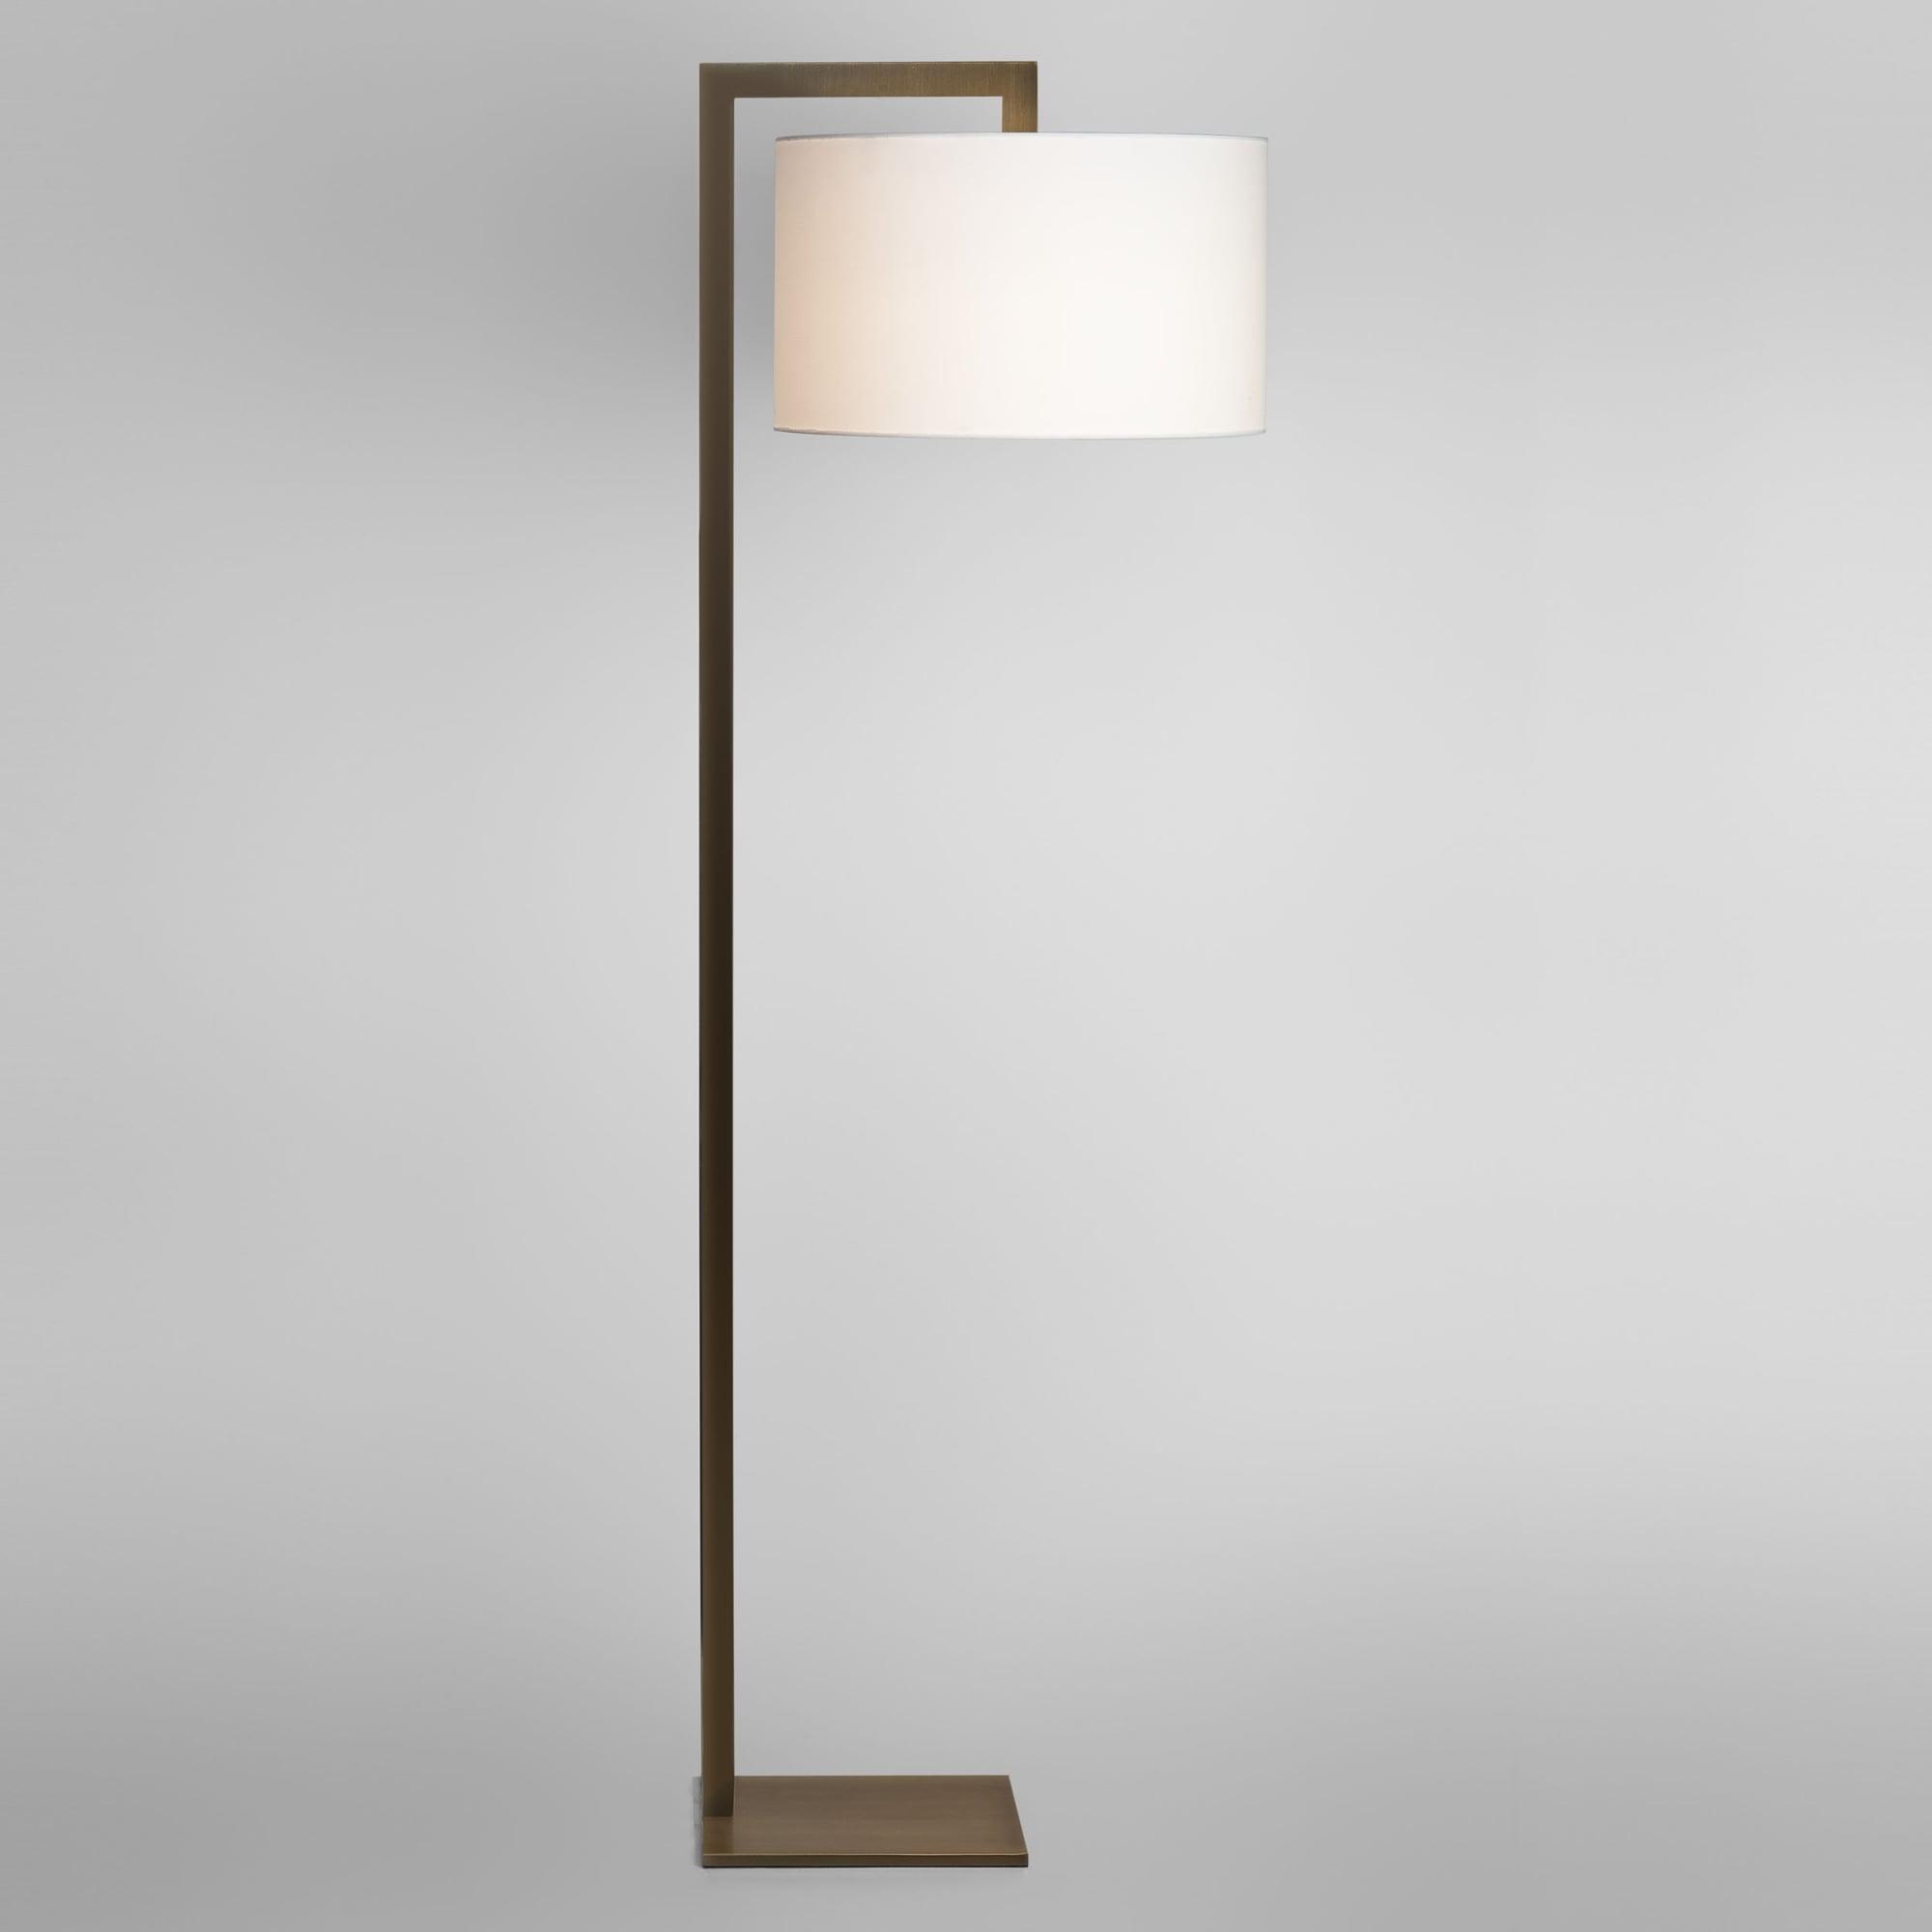 Image of: Astro Sku34912i4l Ravello Floor Light Bronze Ideas4lighting